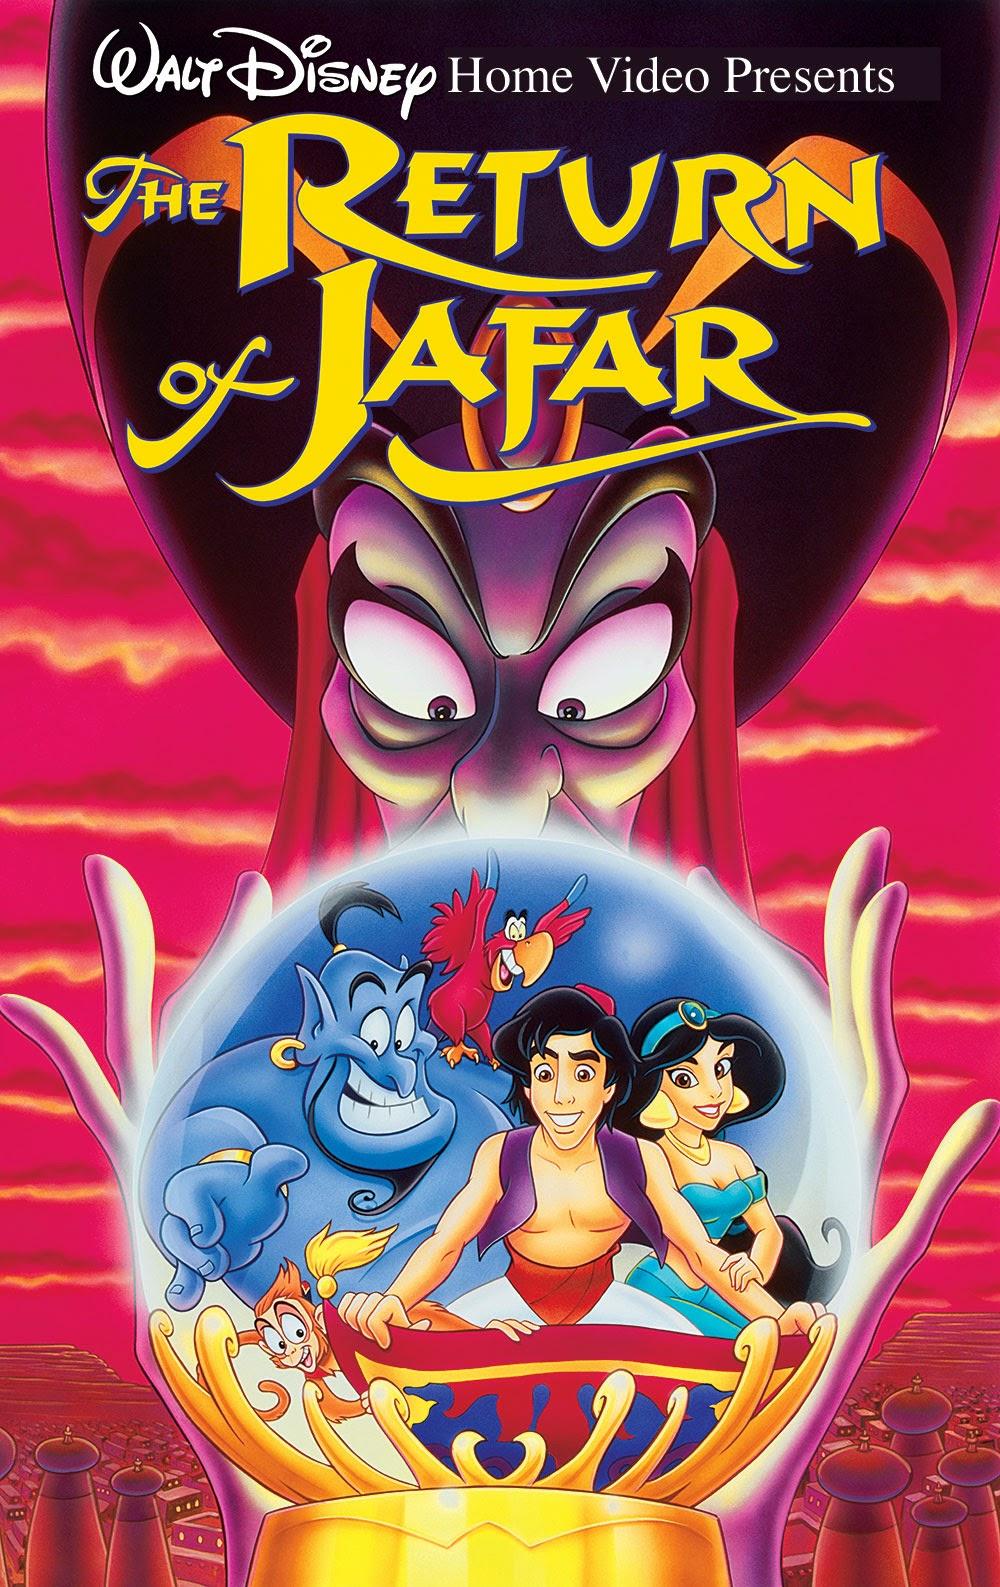 Alladin-Return-of-Jafar-Movie